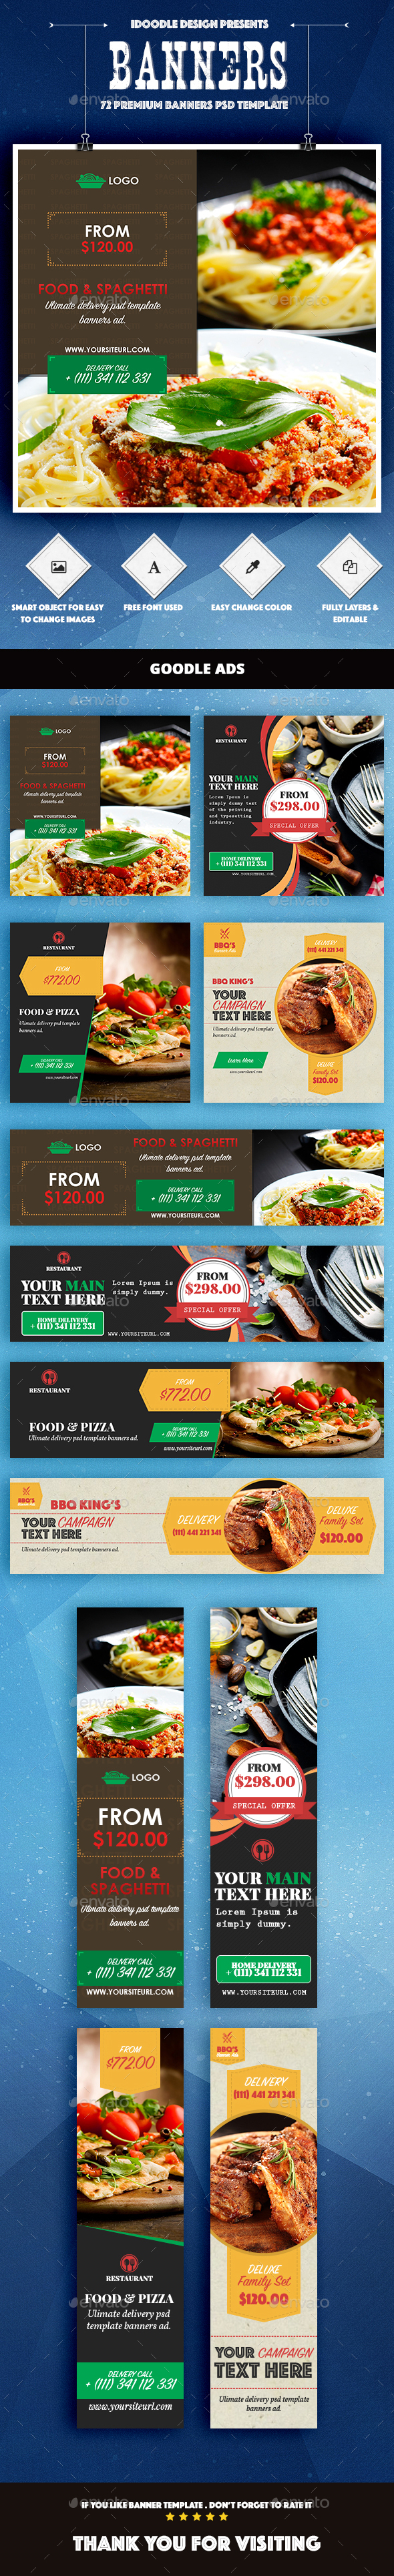 Bundle - Food & Restaurant Banners Ad - 72 PSD [04 Sets]